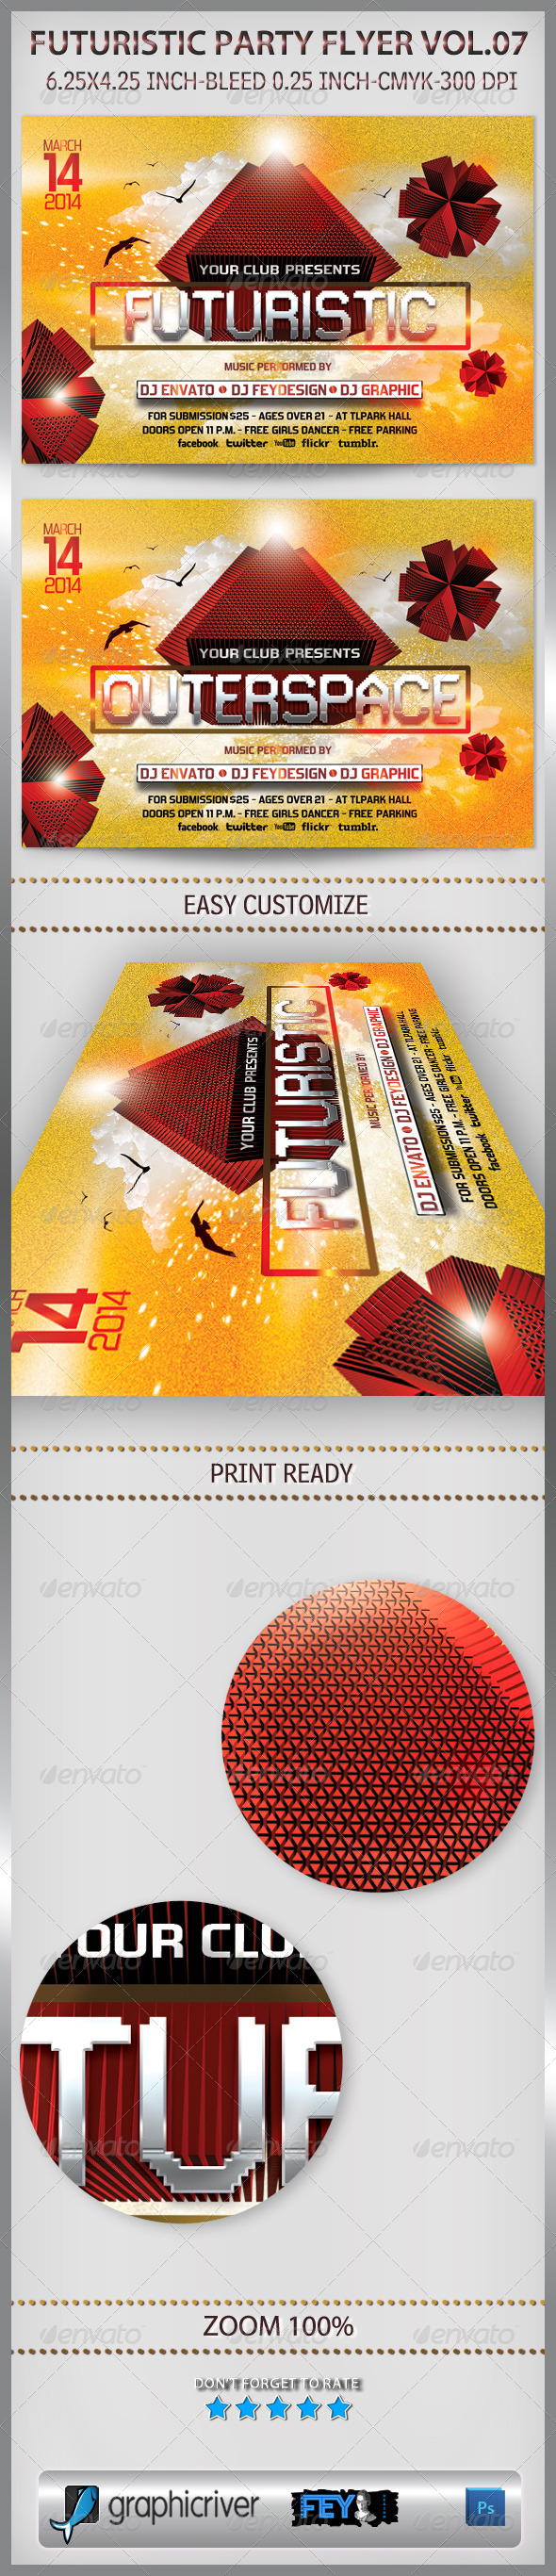 Futuristic Party Flyer Vol.07 - Flyers Print Templates